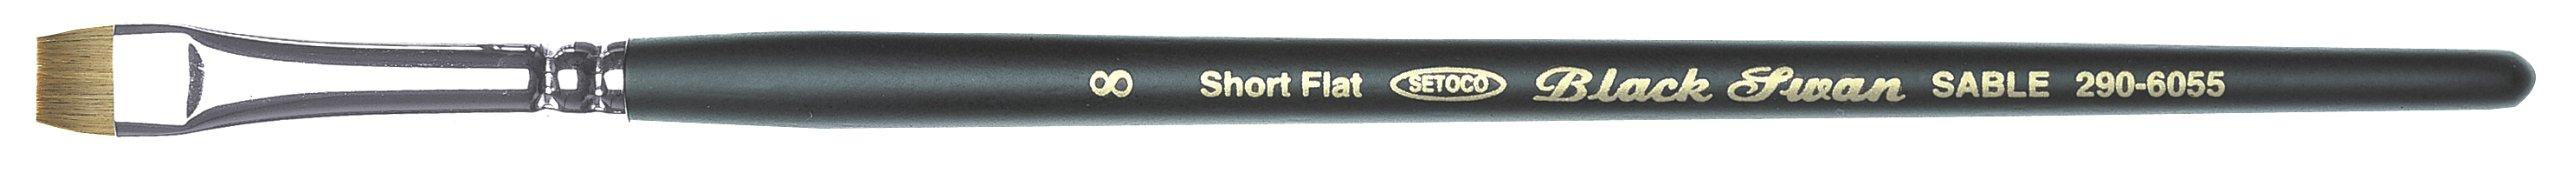 Setokoakuriru-watercolor brush Black Swan black axis disabled script No. 6 290-6028 (japan import)